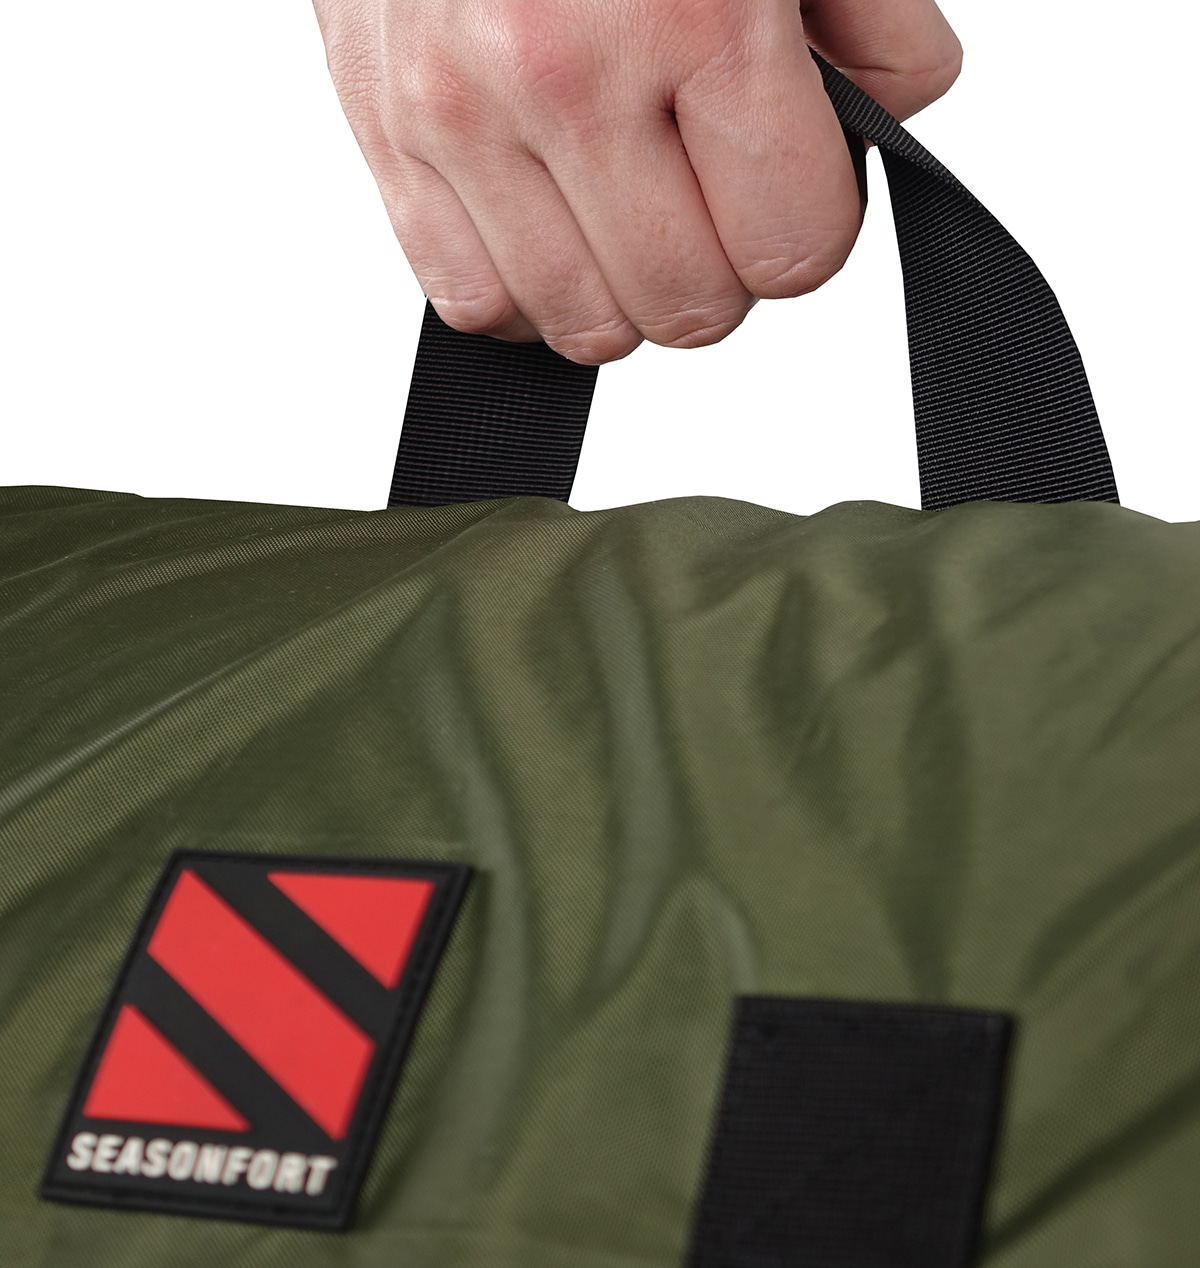 SEASONFORT UNTAMED Backpack Bed carry handle